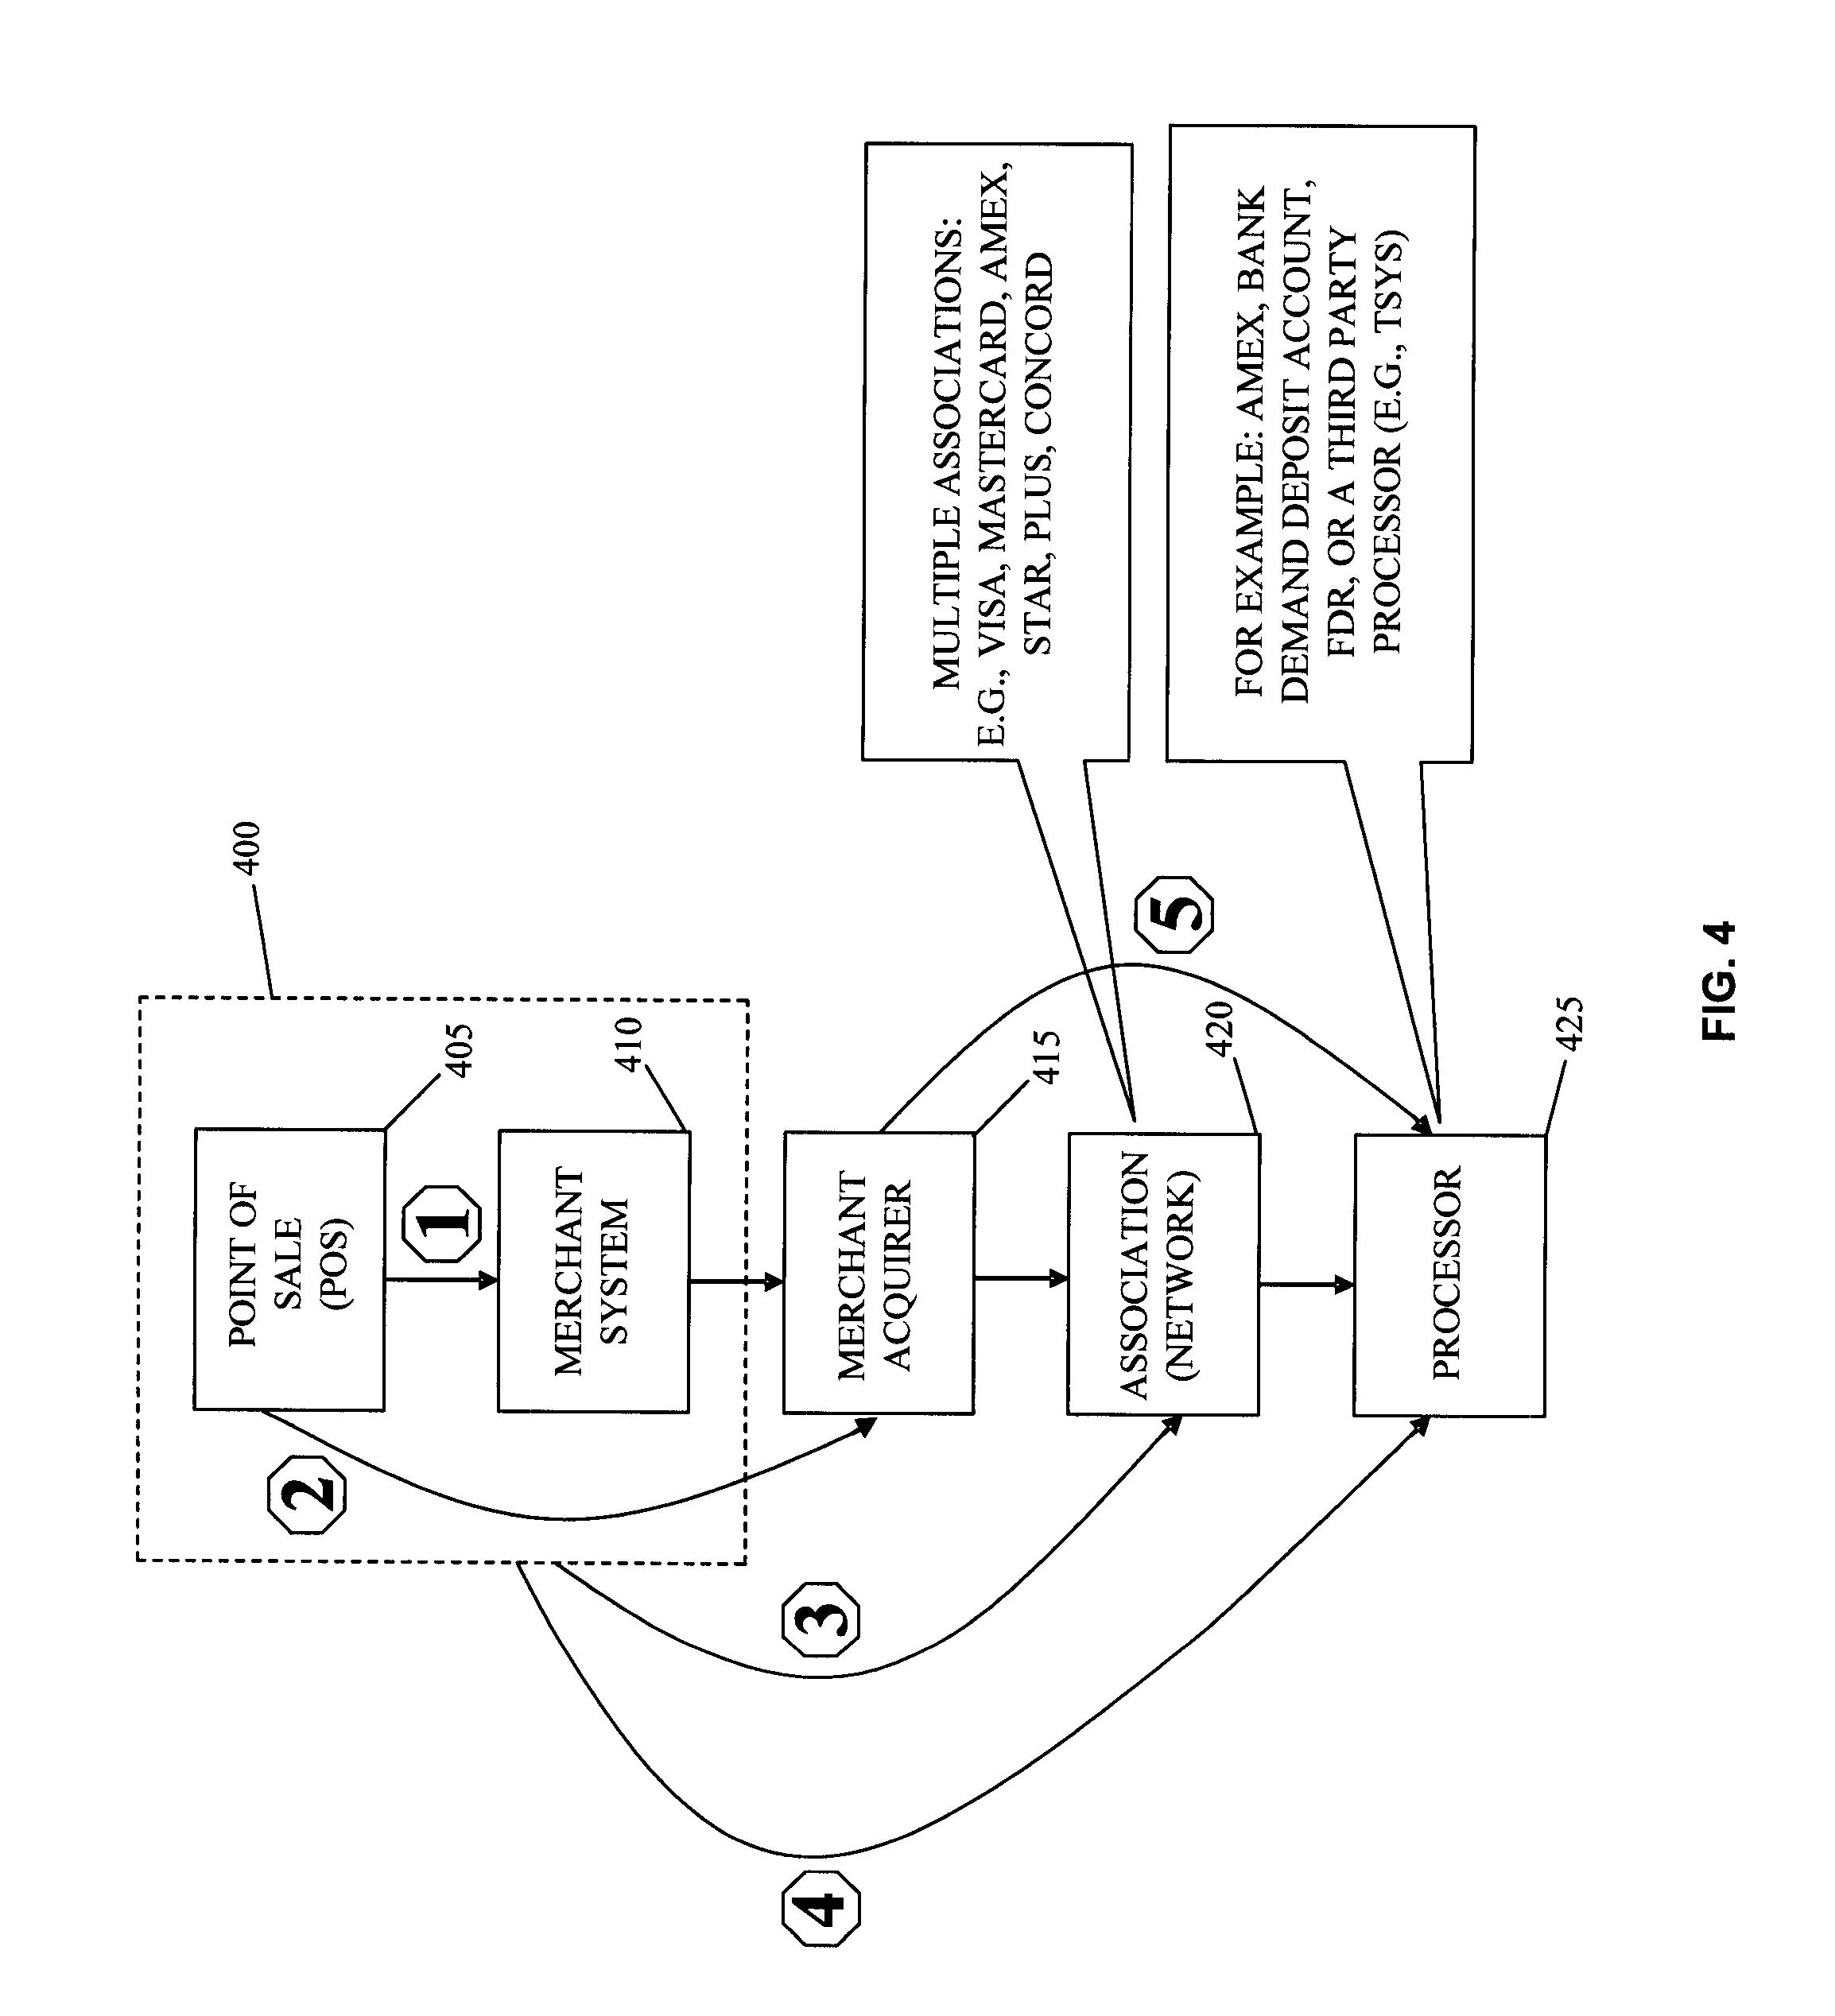 Patent US 8,751,383 B2